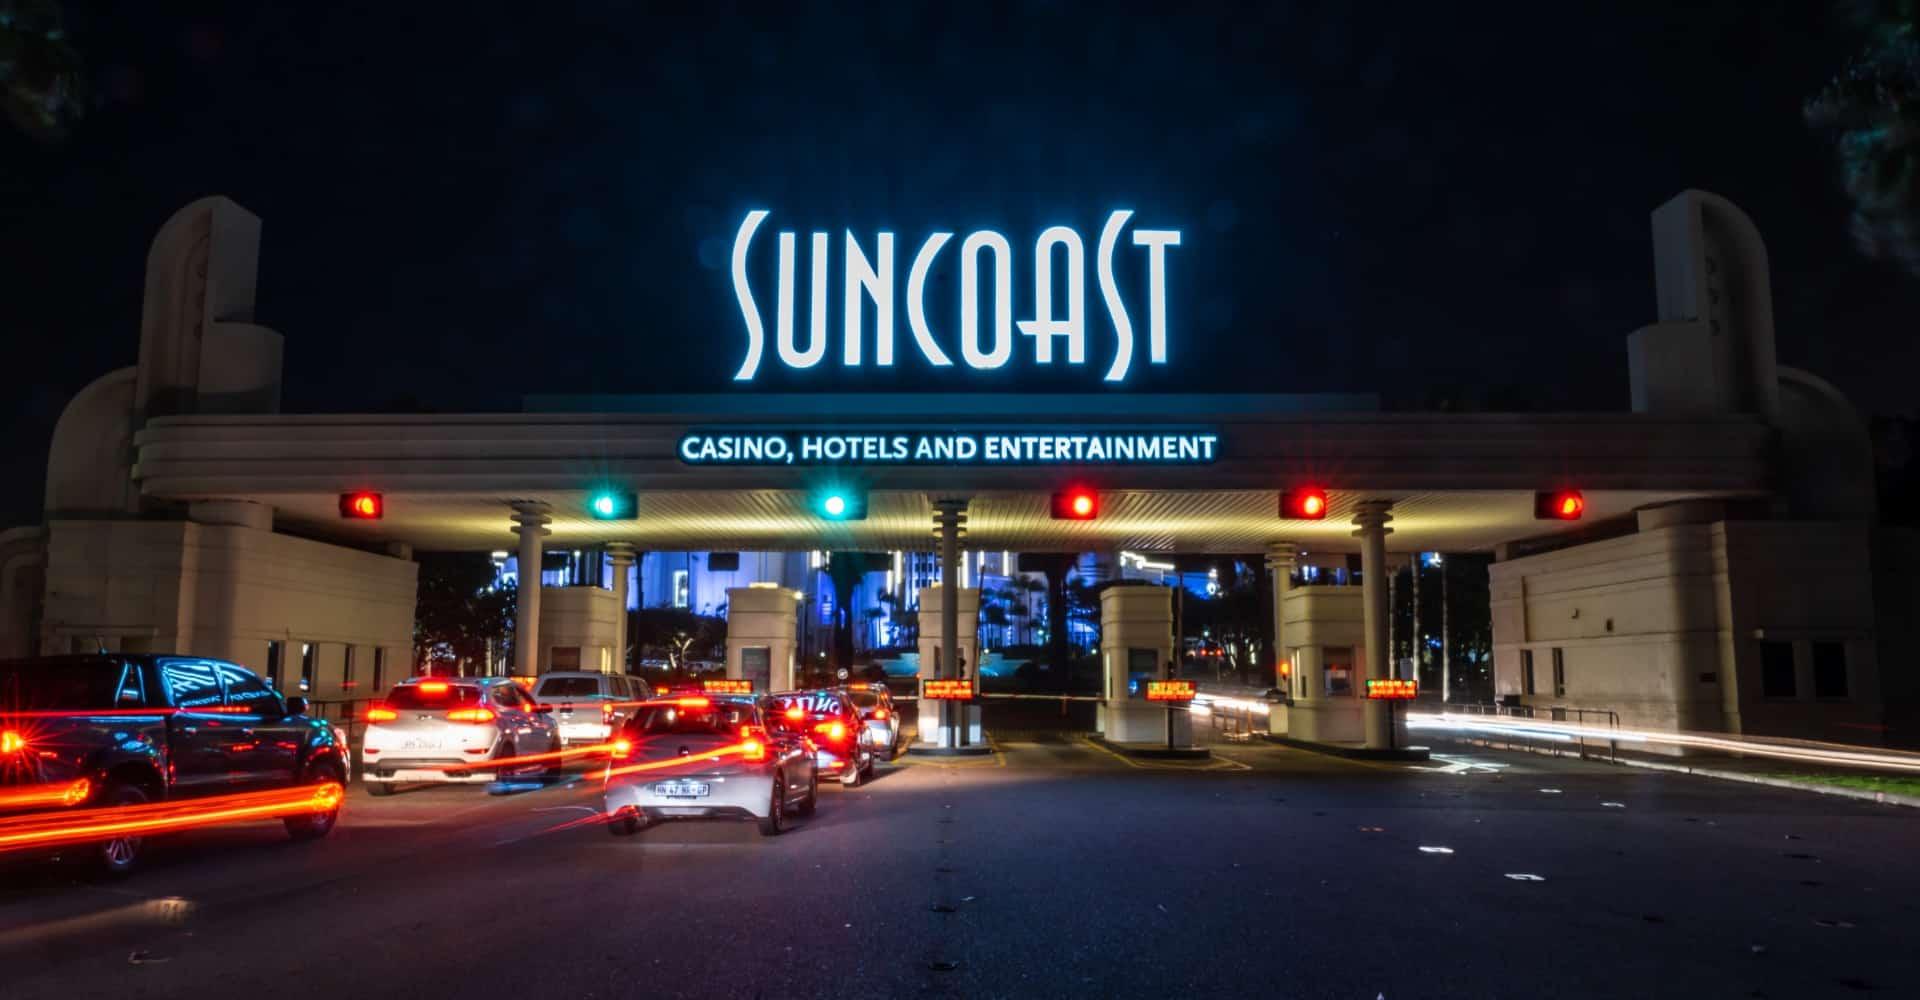 Suncoast Casino entrance